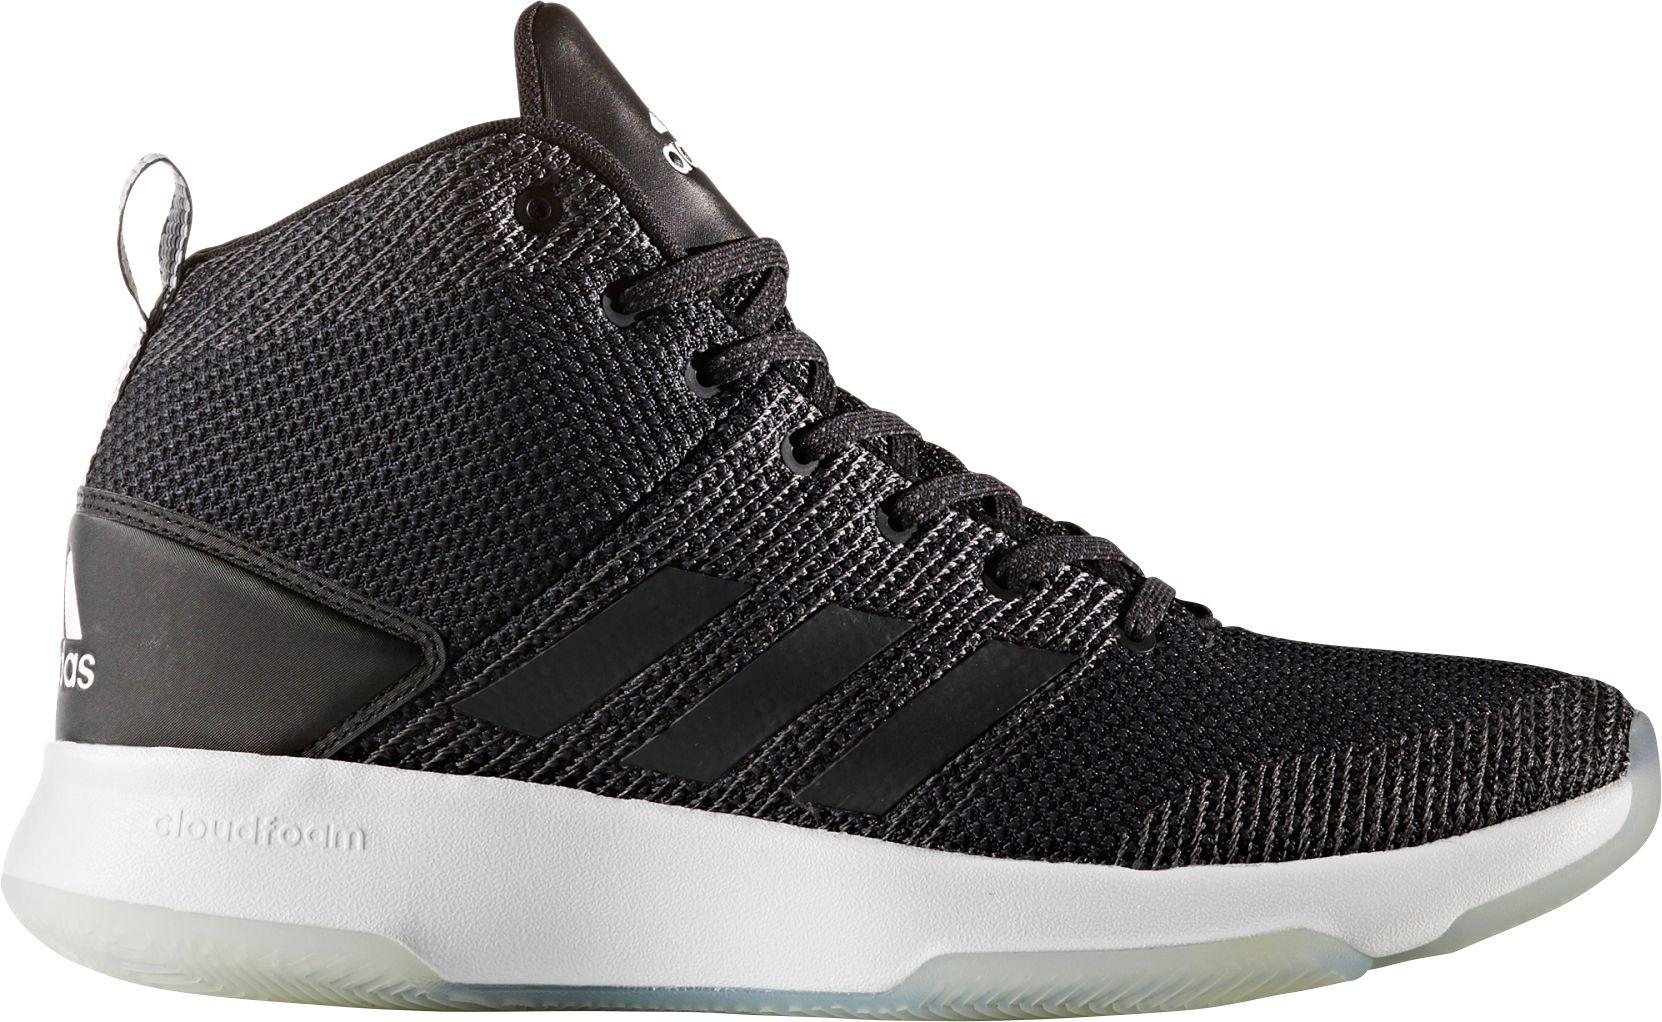 Adidas Men S Cloudfoam Executor Mid Basketball Shoes